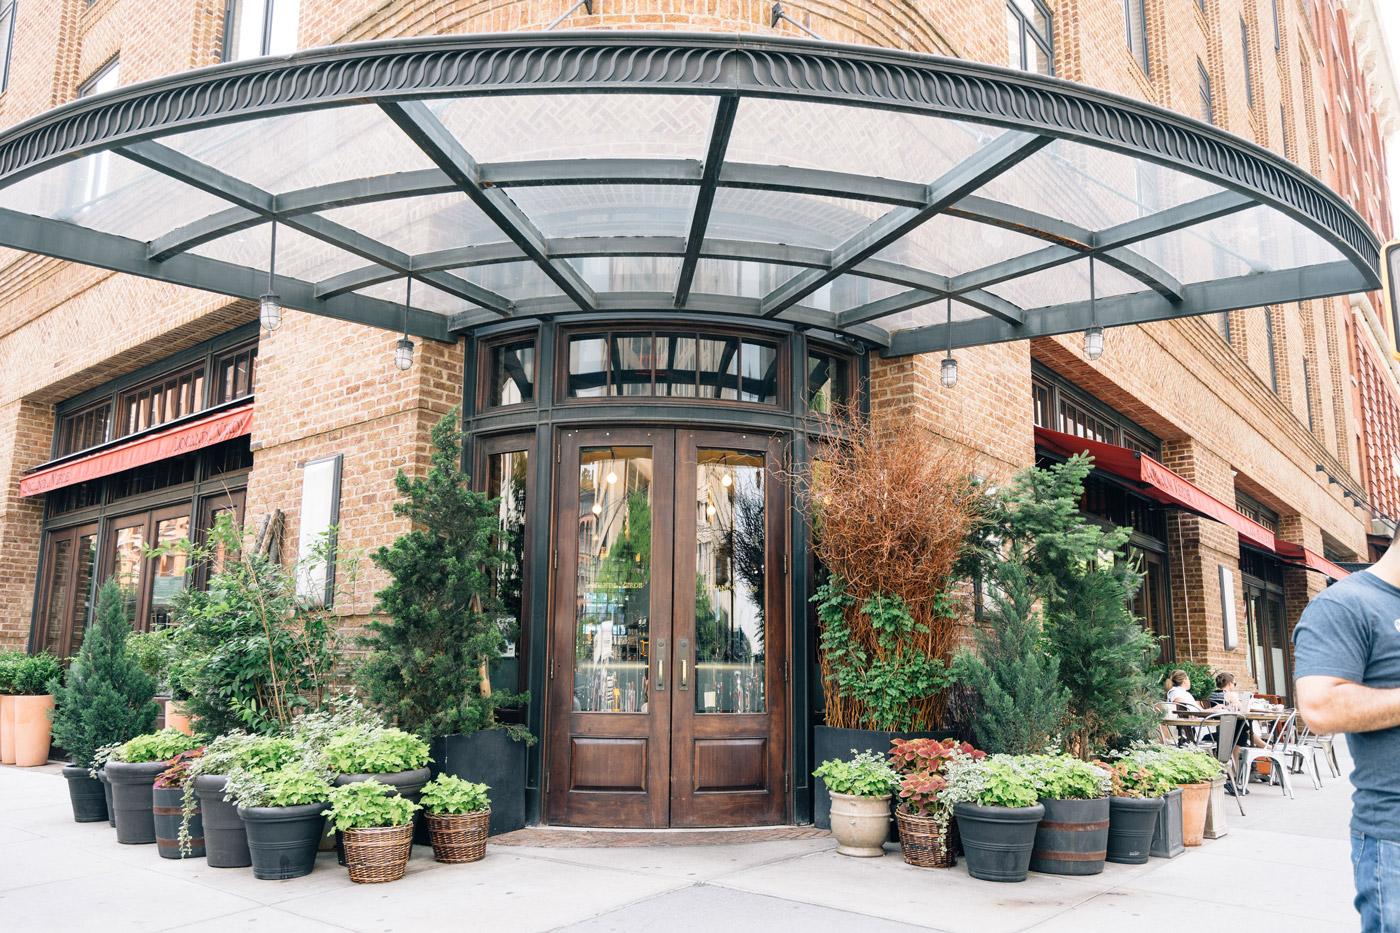 The Tribeca hotspot Locanda Verde 377 Greenwich St, New York, NY 10013